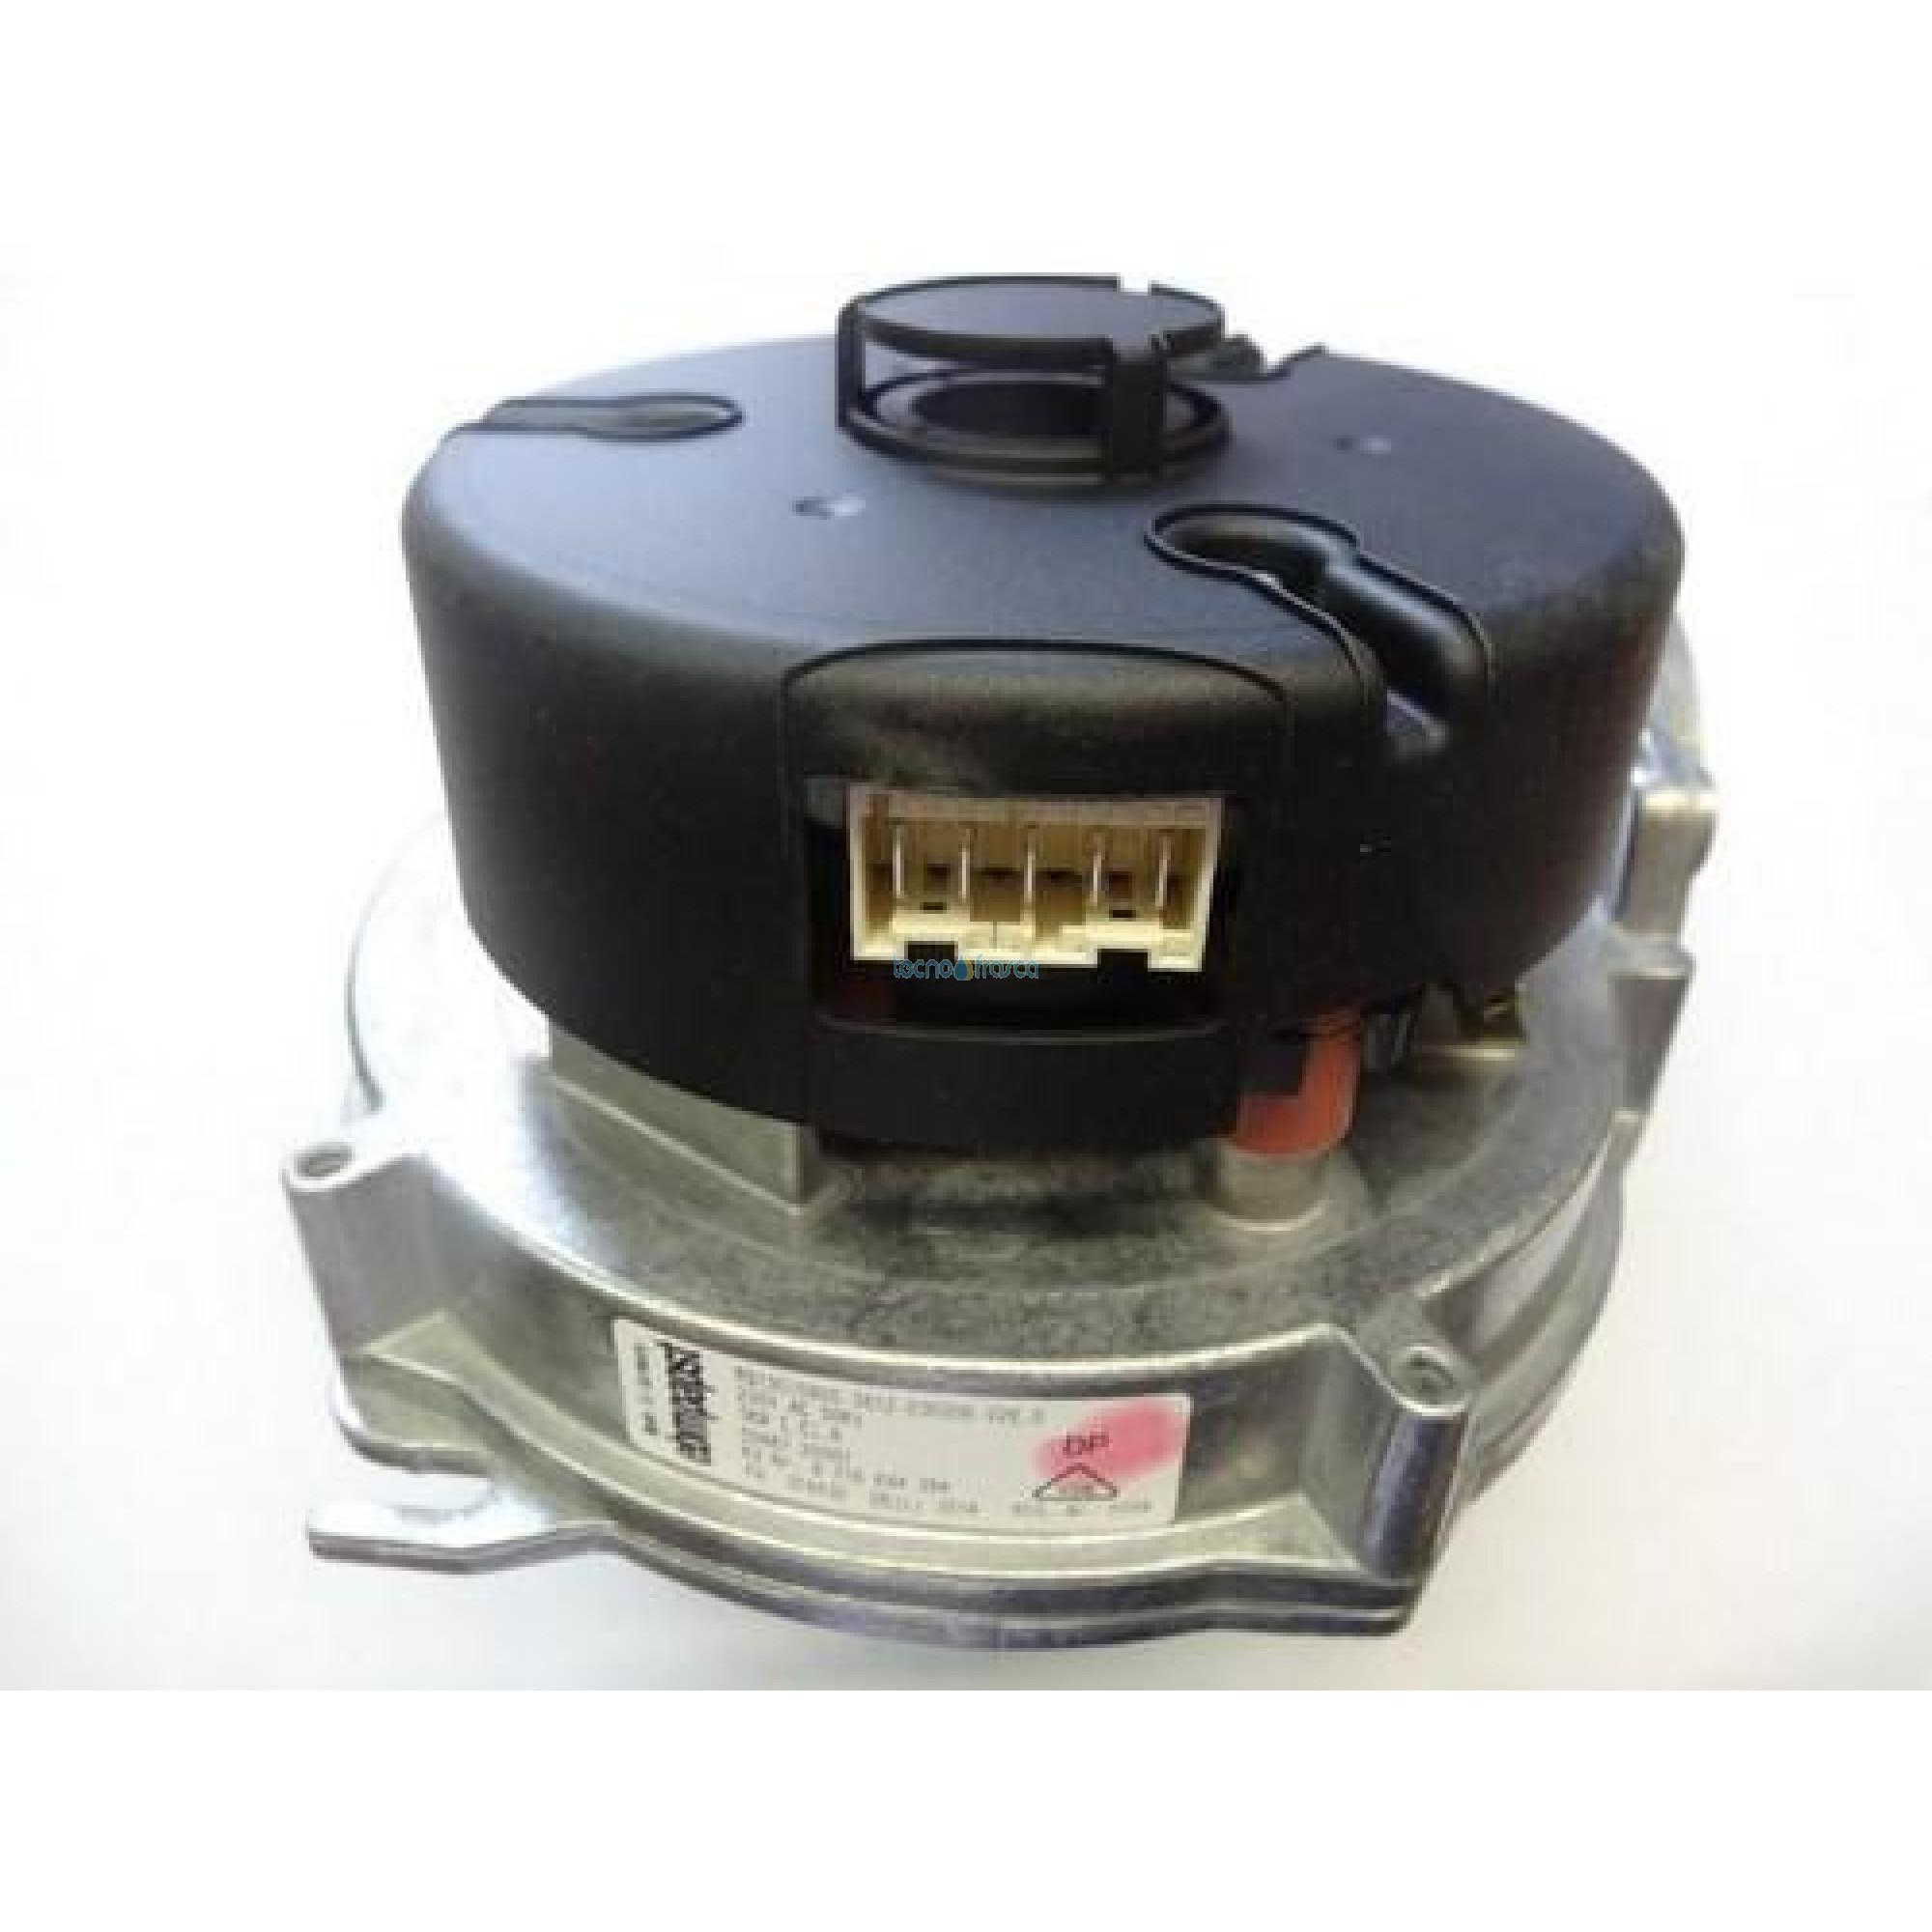 Junkers bosch estrattore zb24-3c23s0400 cerapur smart24 8717204410